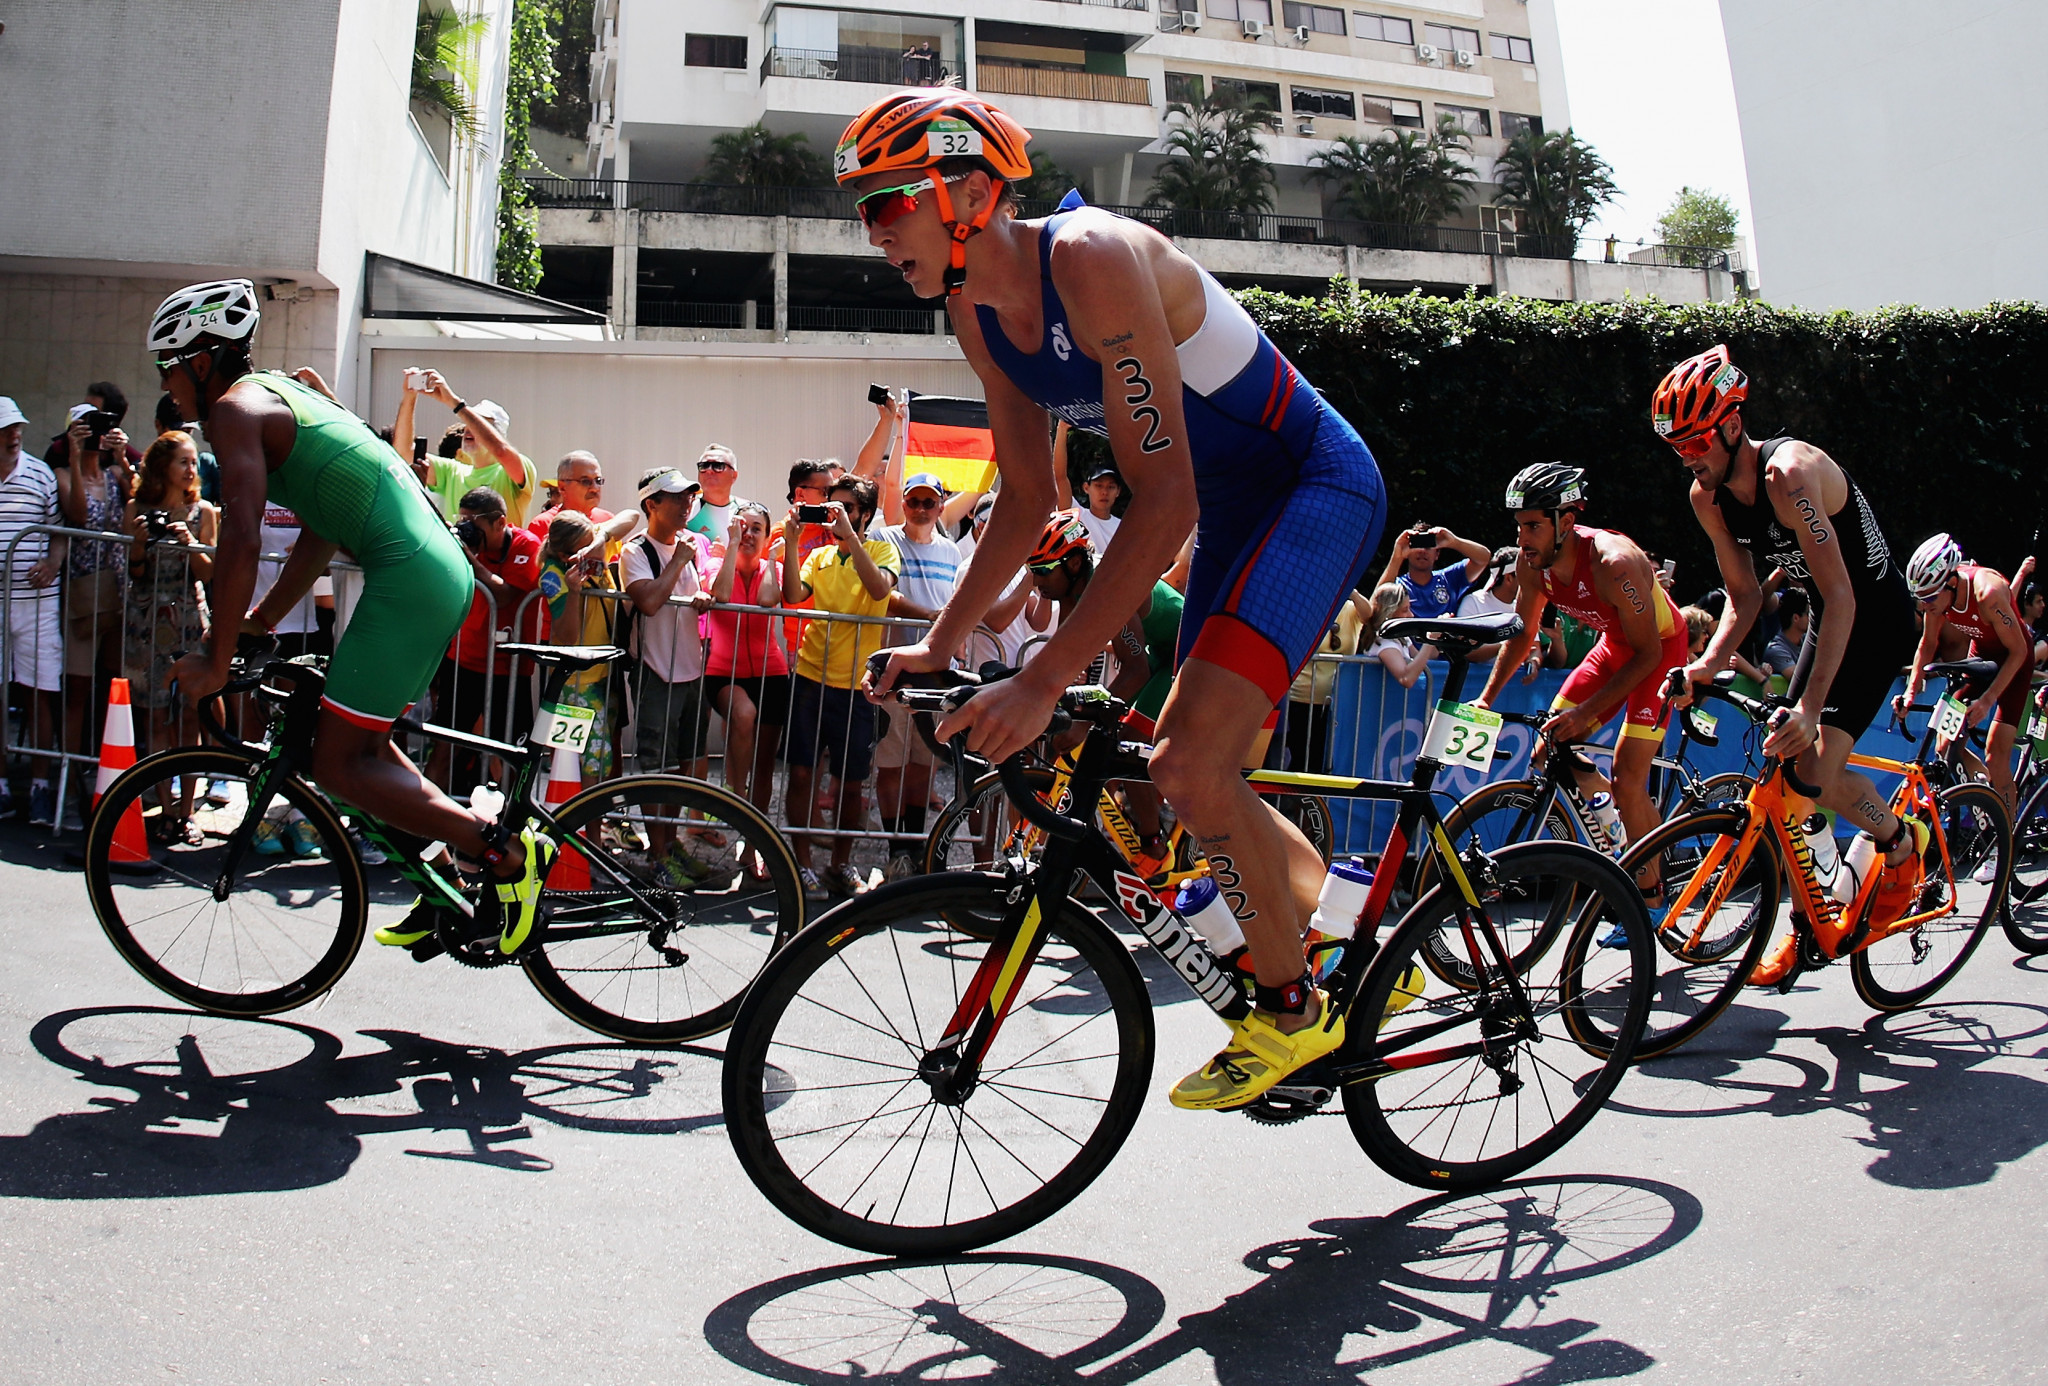 Home hopes high as Huelva prepares to host maiden ITU World Cup